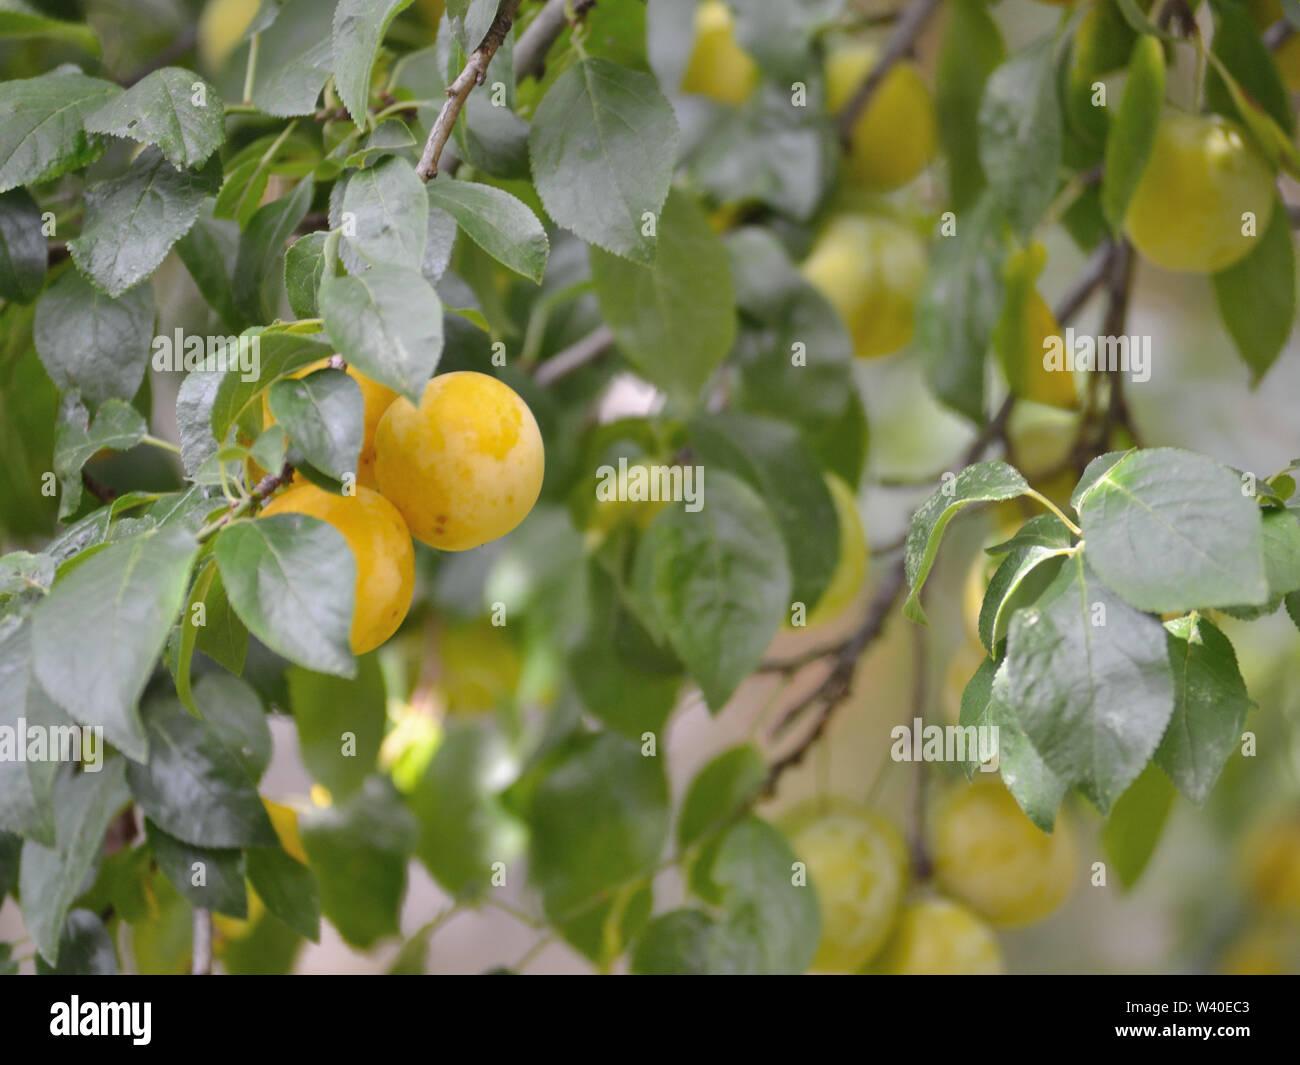 Yellow plums on plum tree - Stock Image